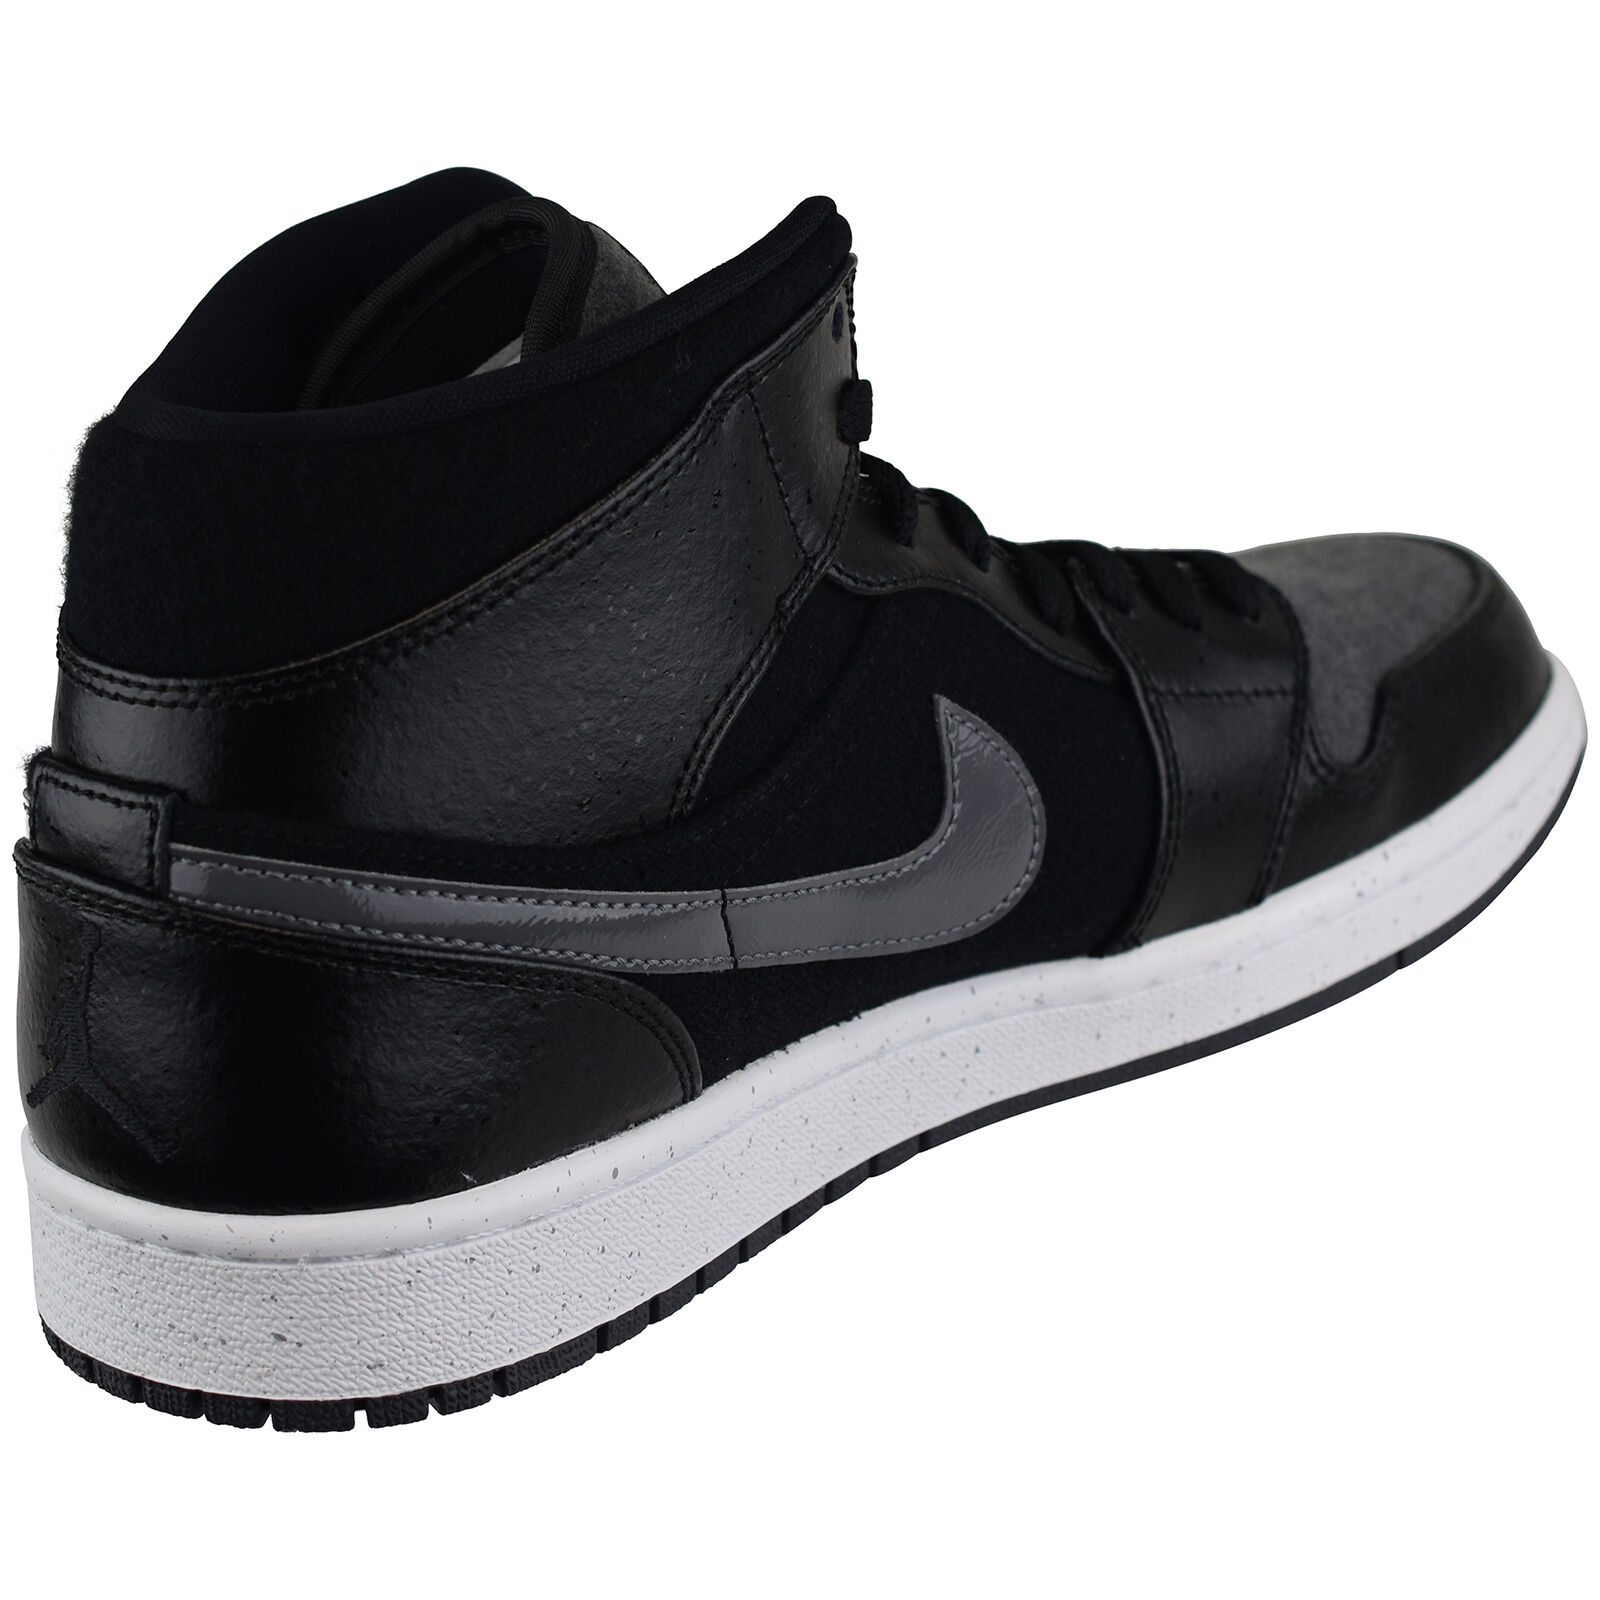 NIKE Air Jordan Jordan Jordan 1 Mid Prem 852542-001 Basket Scarpe da Corsa Run scarpe da ginnastica Tempo Libero 8ecf76